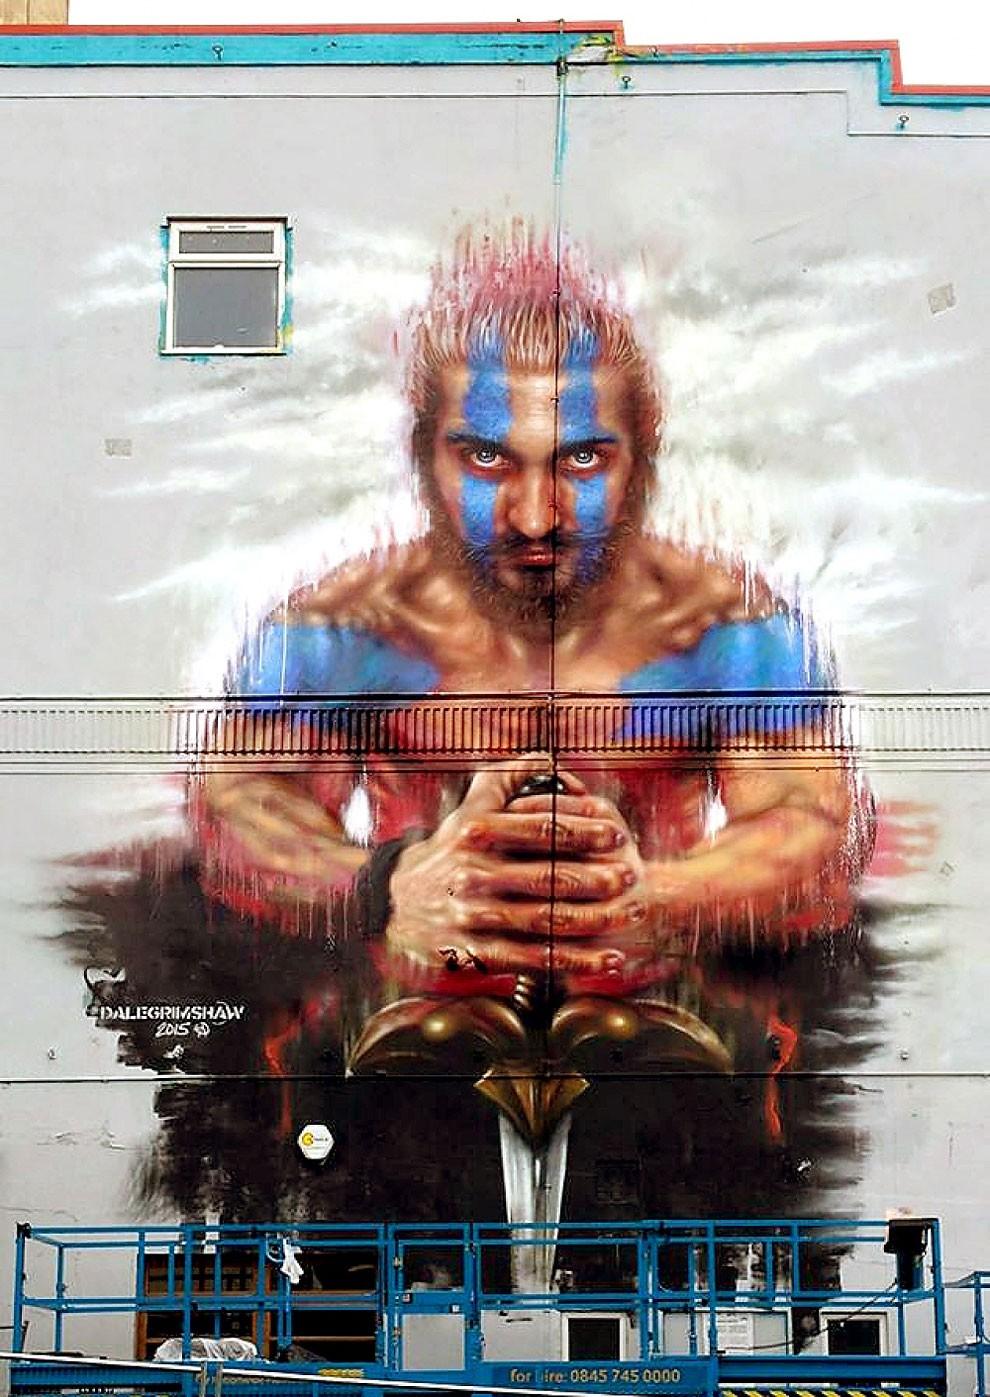 street-art-2015-09